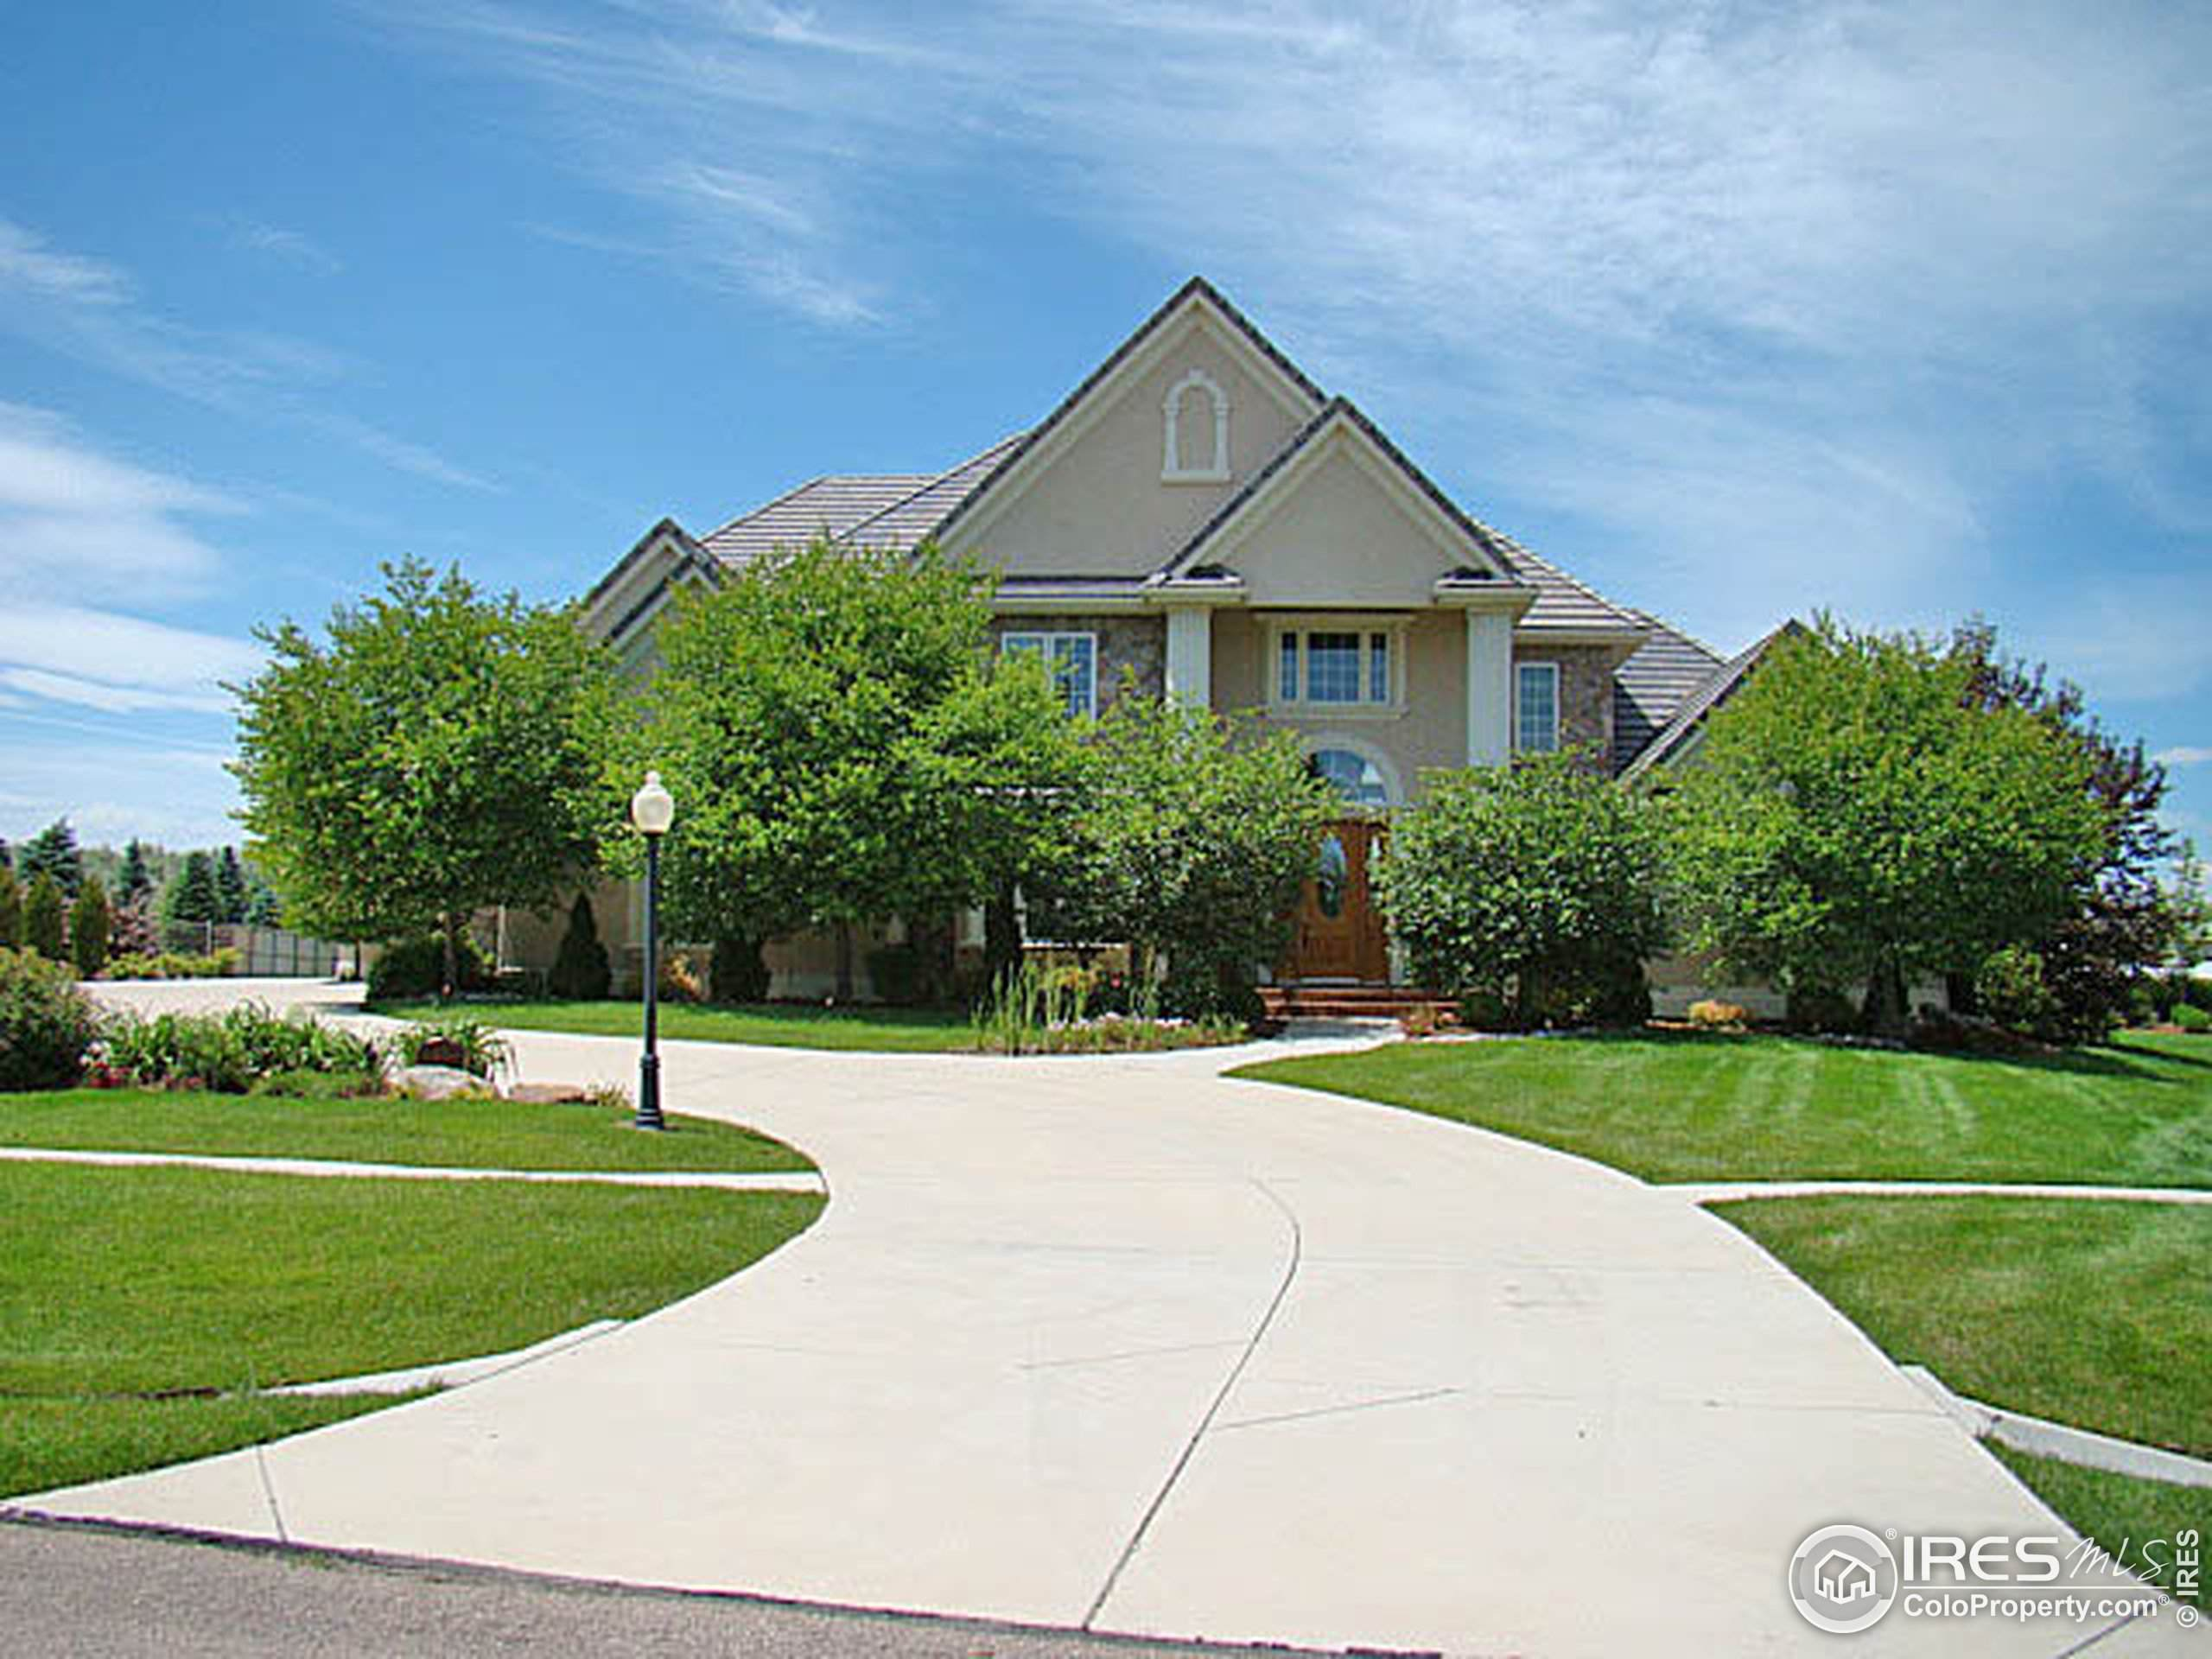 717 Virginia Cir, Penrose, CO 81240 (MLS #902387) :: Colorado Home Finder Realty